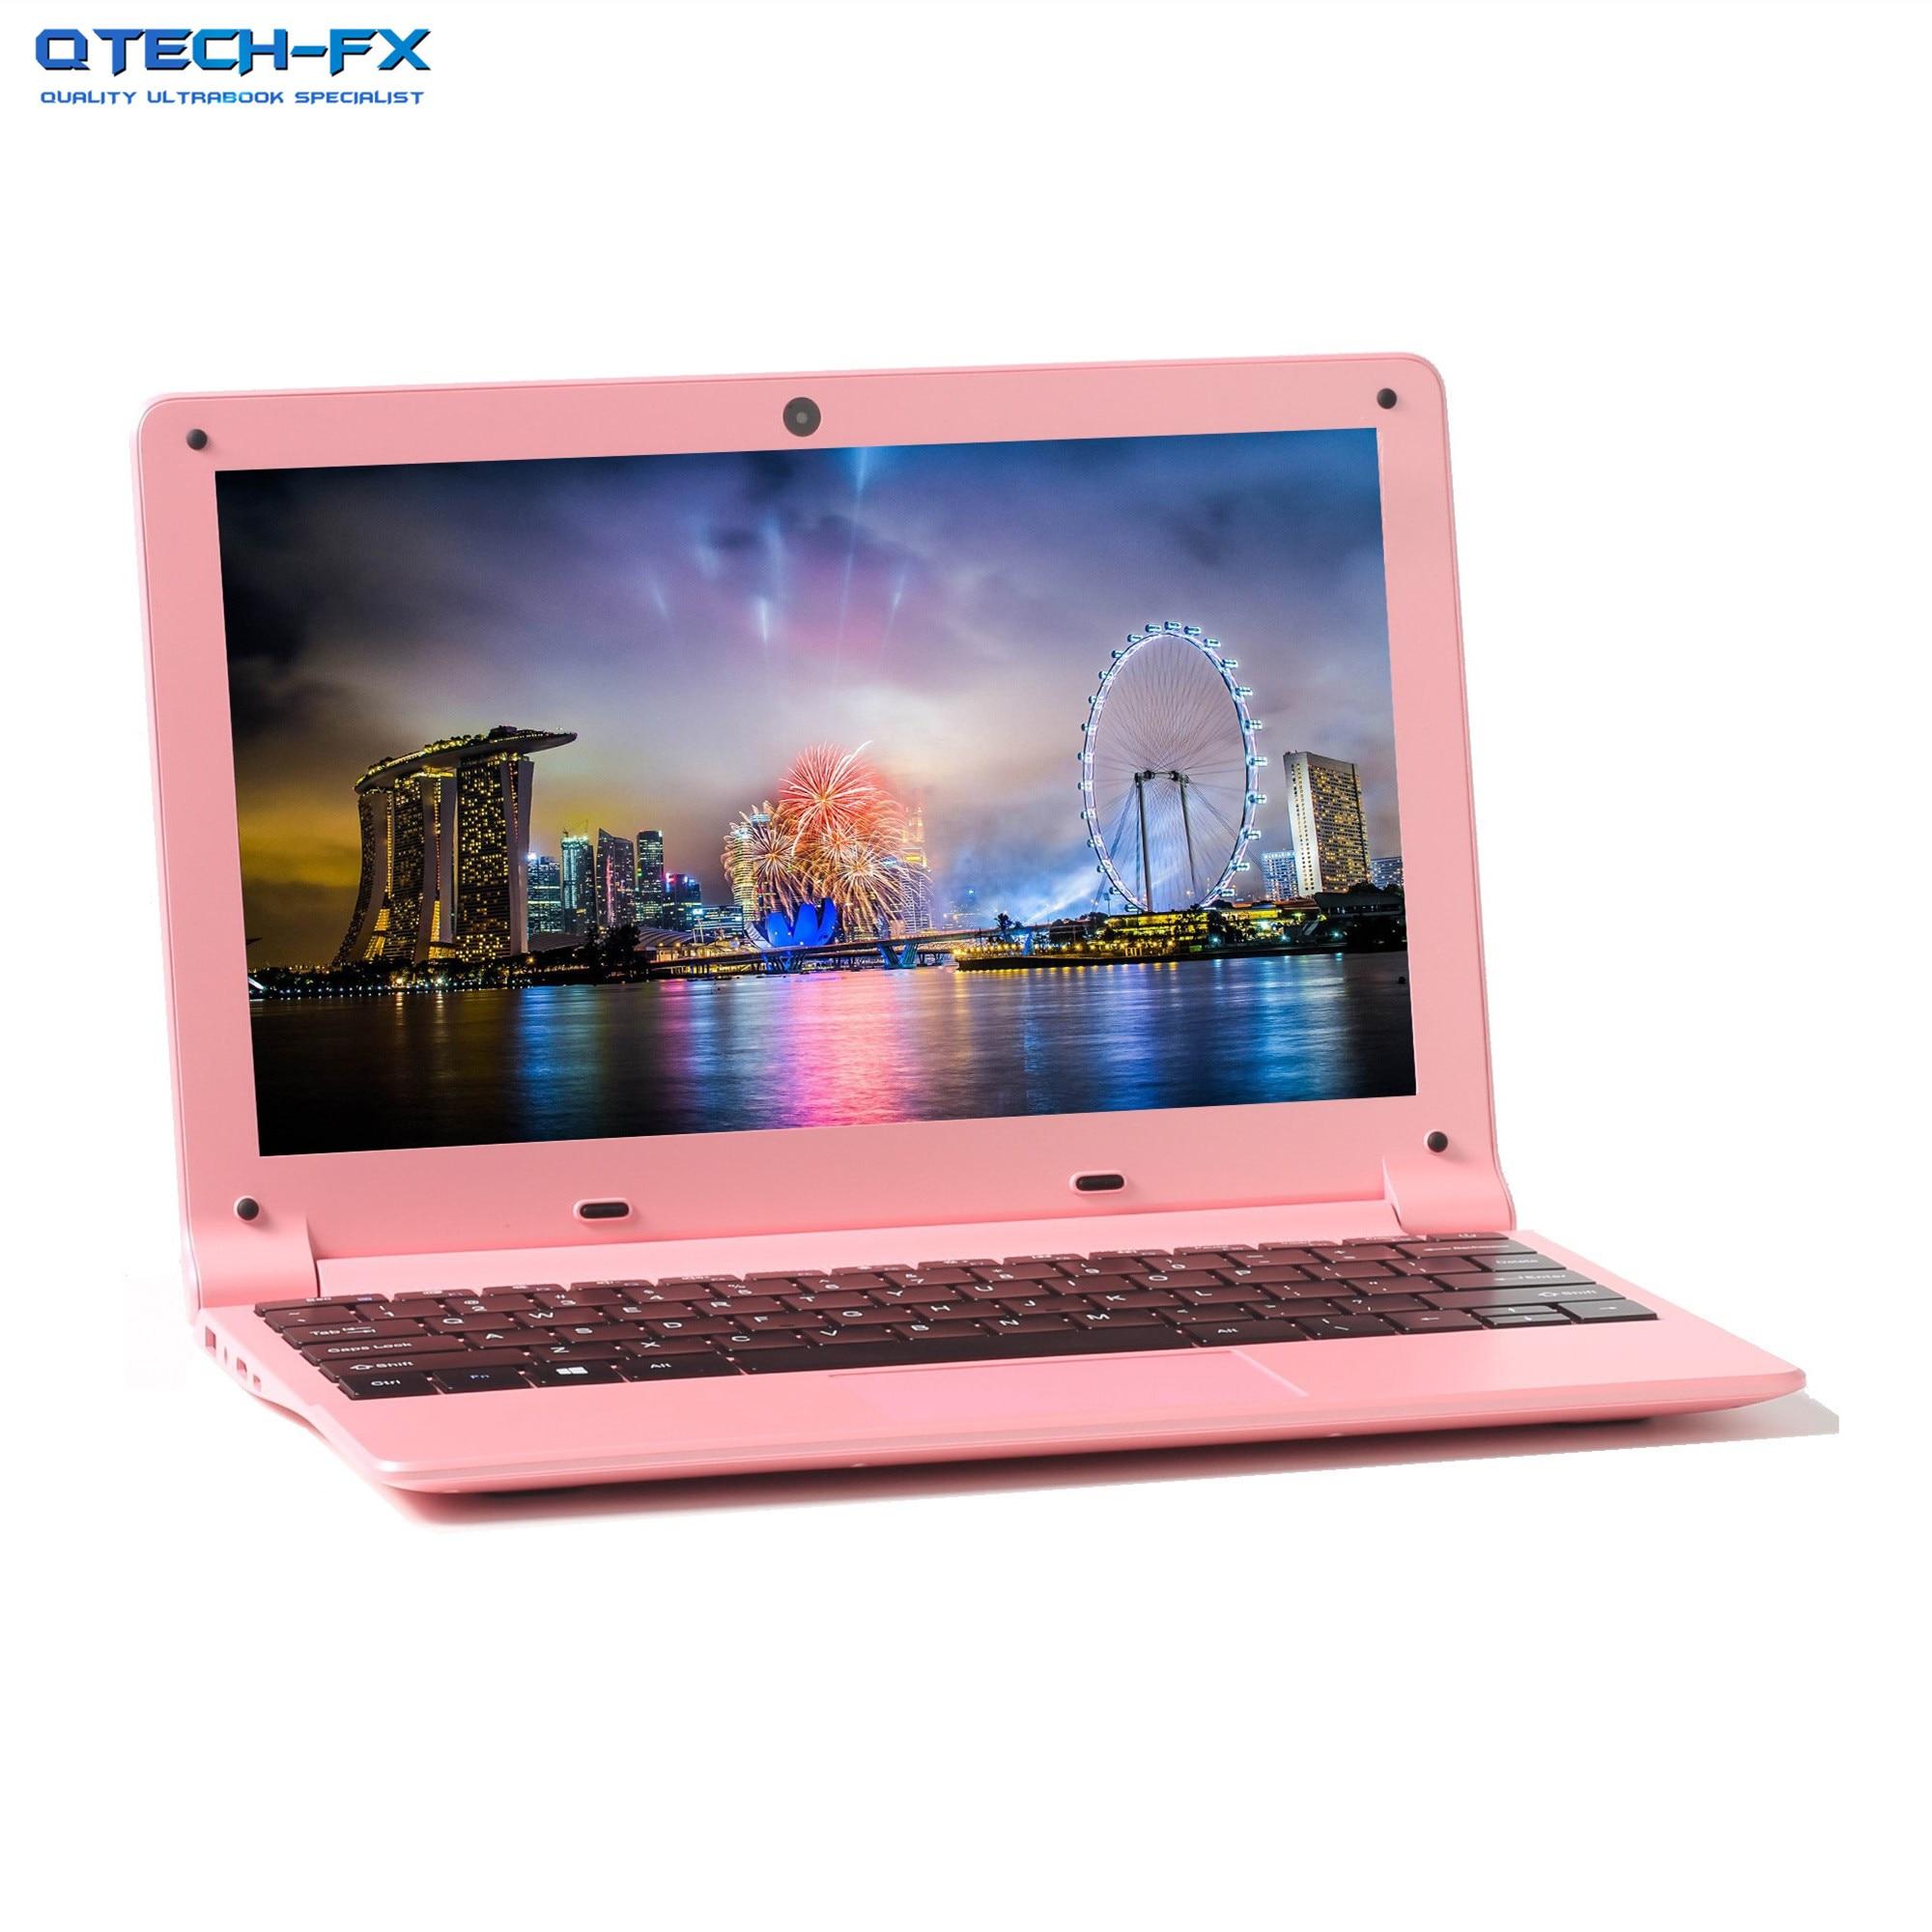 "Fast SSD 256GB 12"" Ultrabook CPU intel Quad Core Windows 10 Business School Pink Black Arabic AZERTY Spanish Russian Keyboard|Laptops| |  - title="